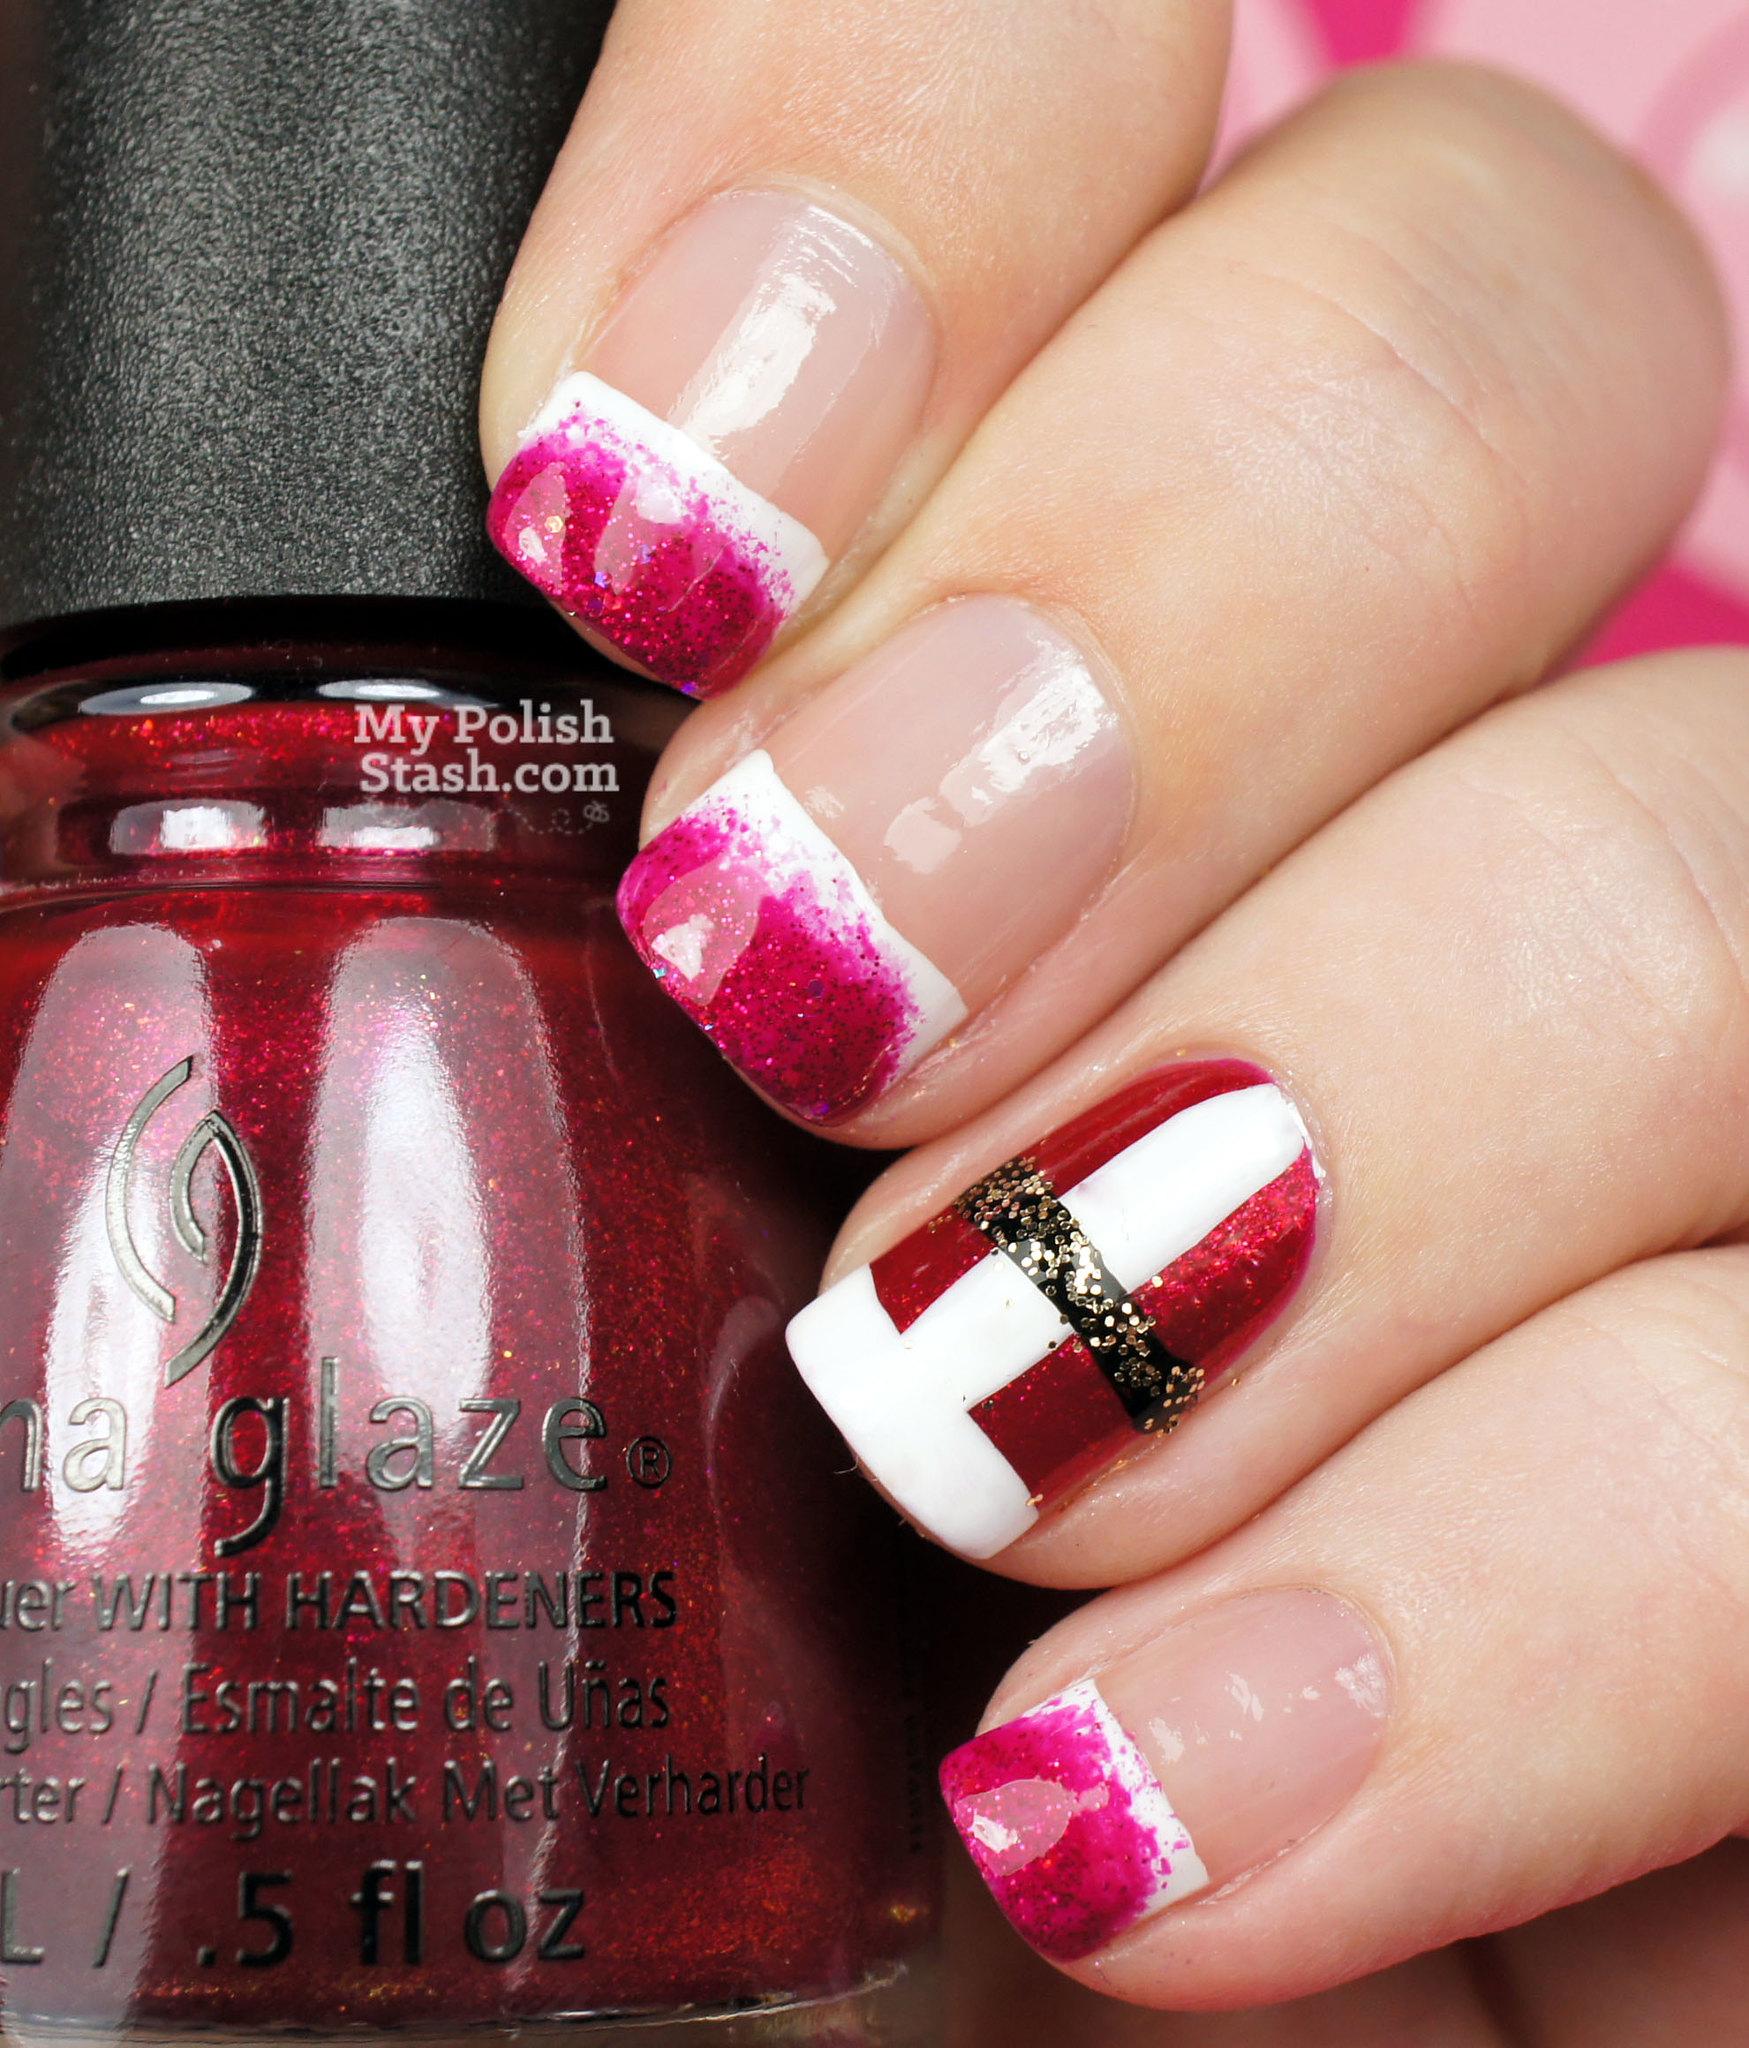 santa-manicure-2